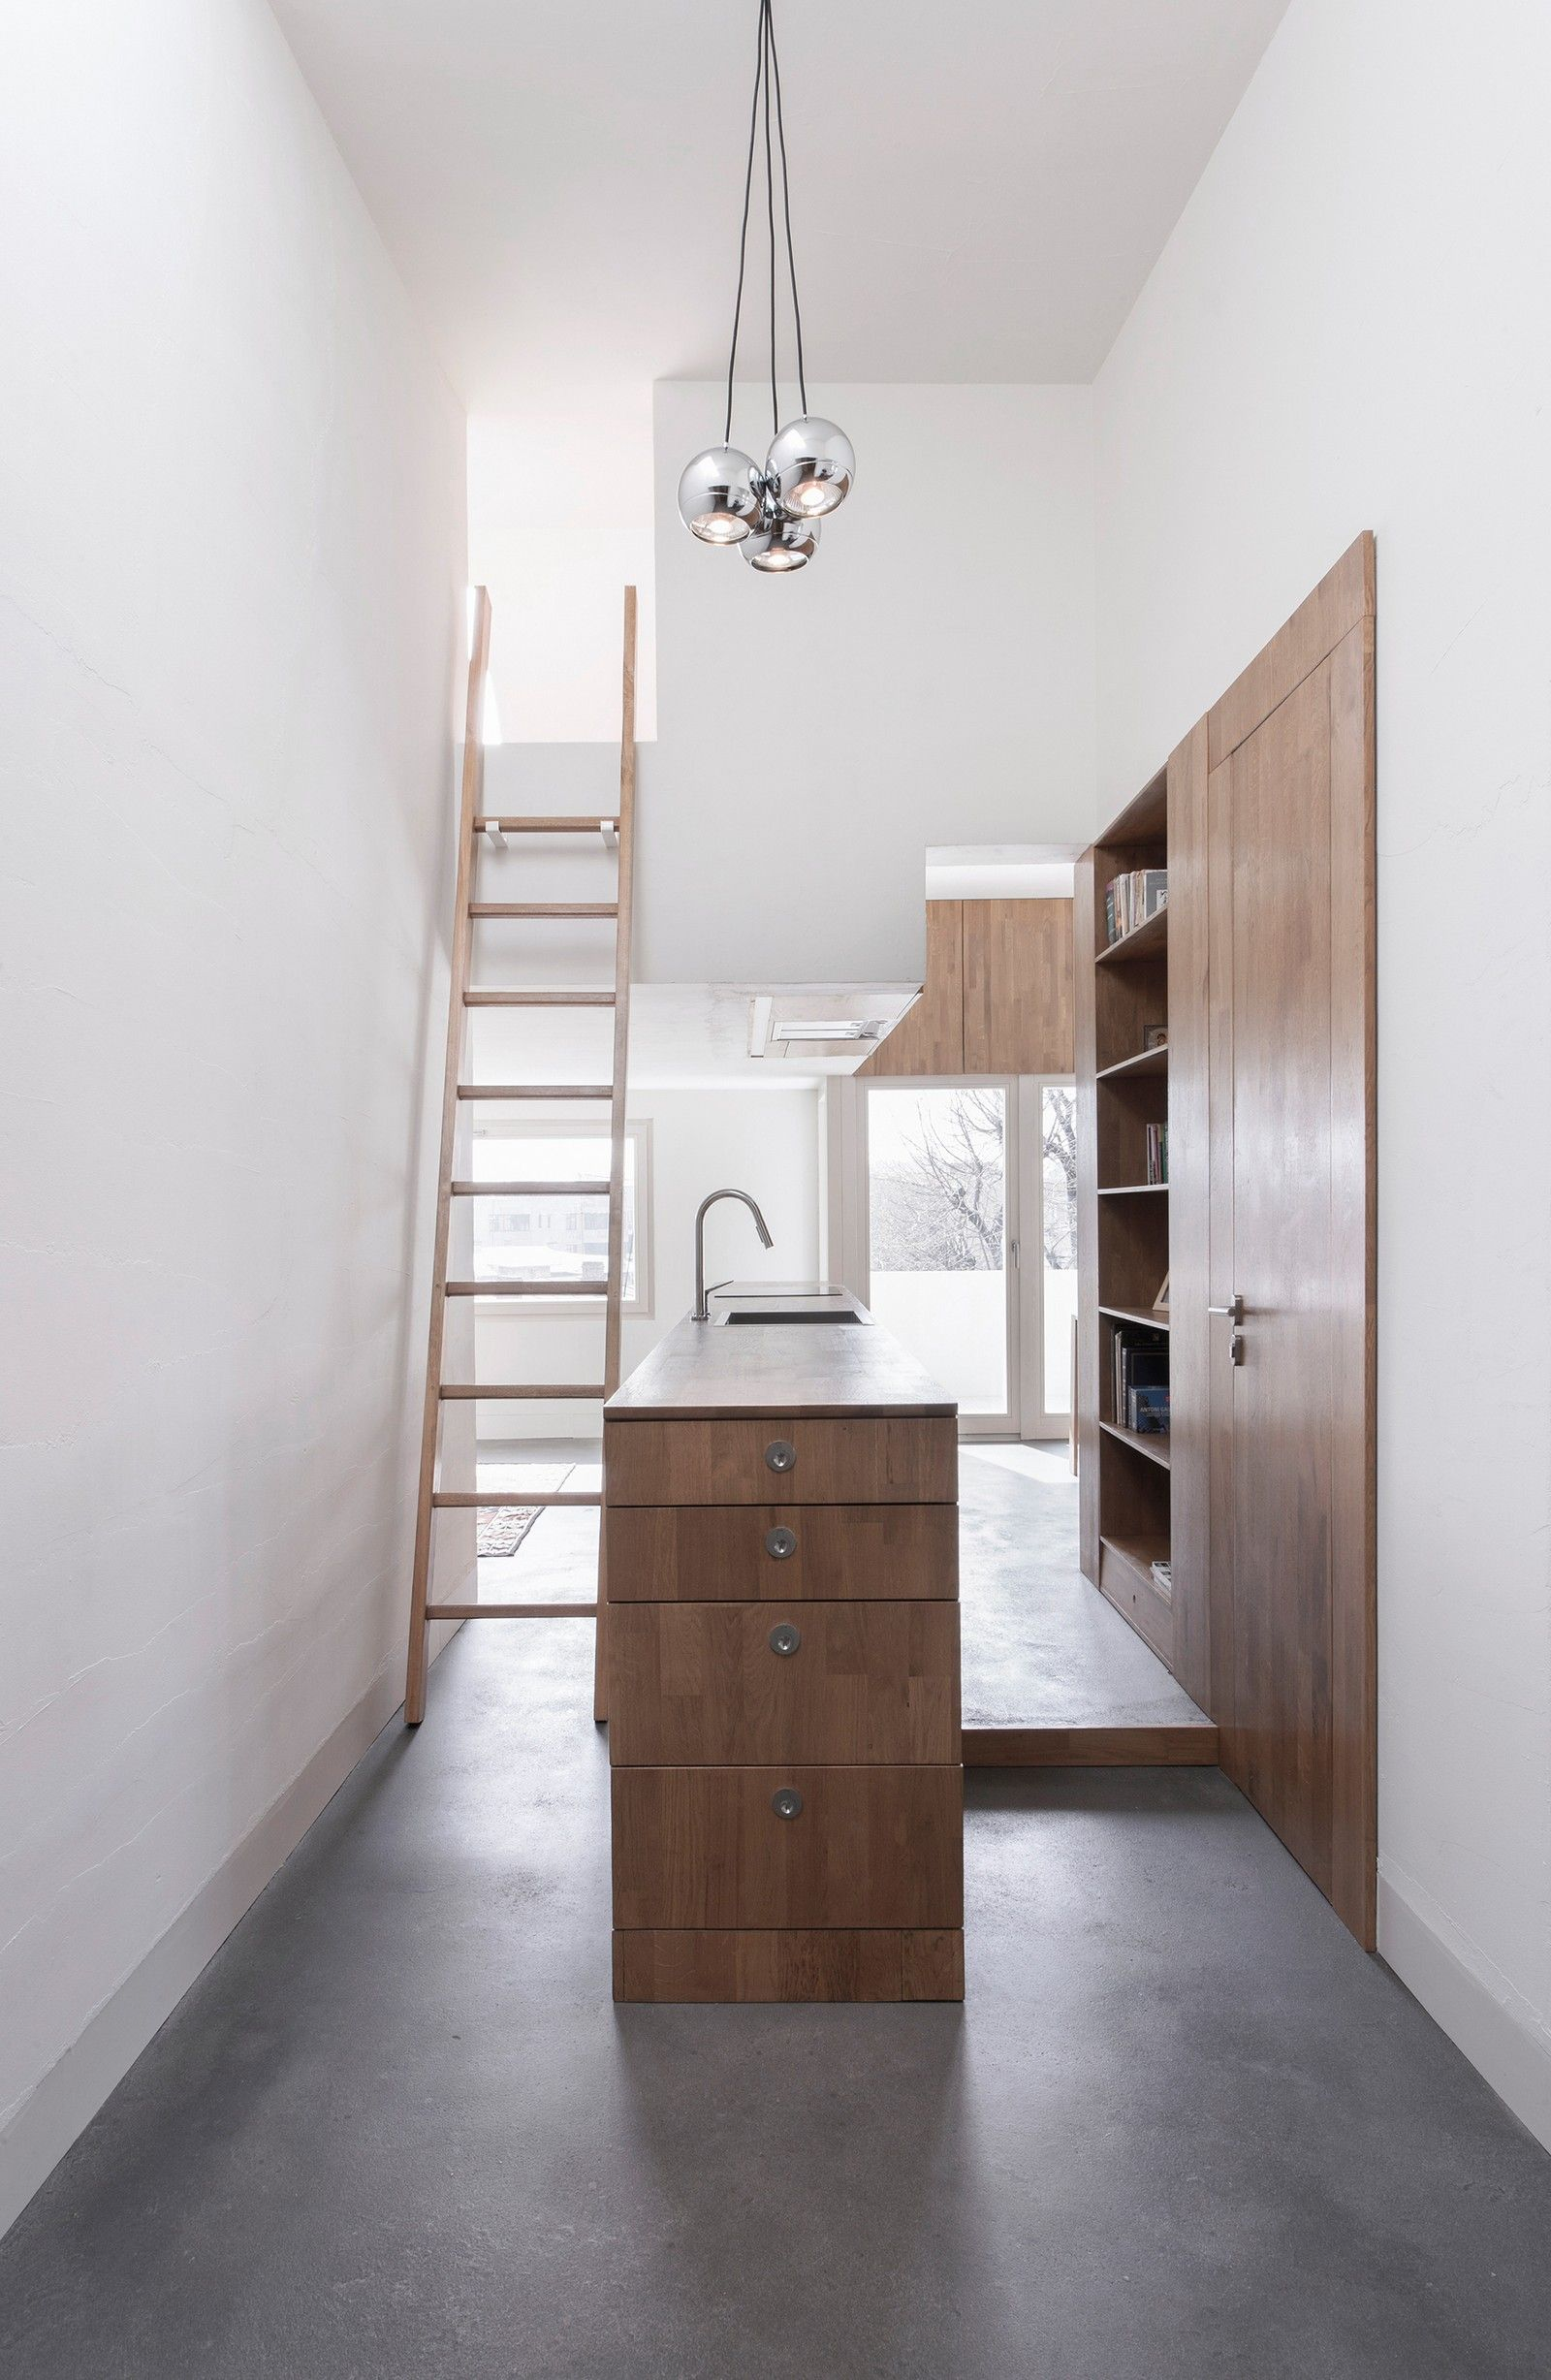 Archello minimal pinterest attic interiors and kitchens